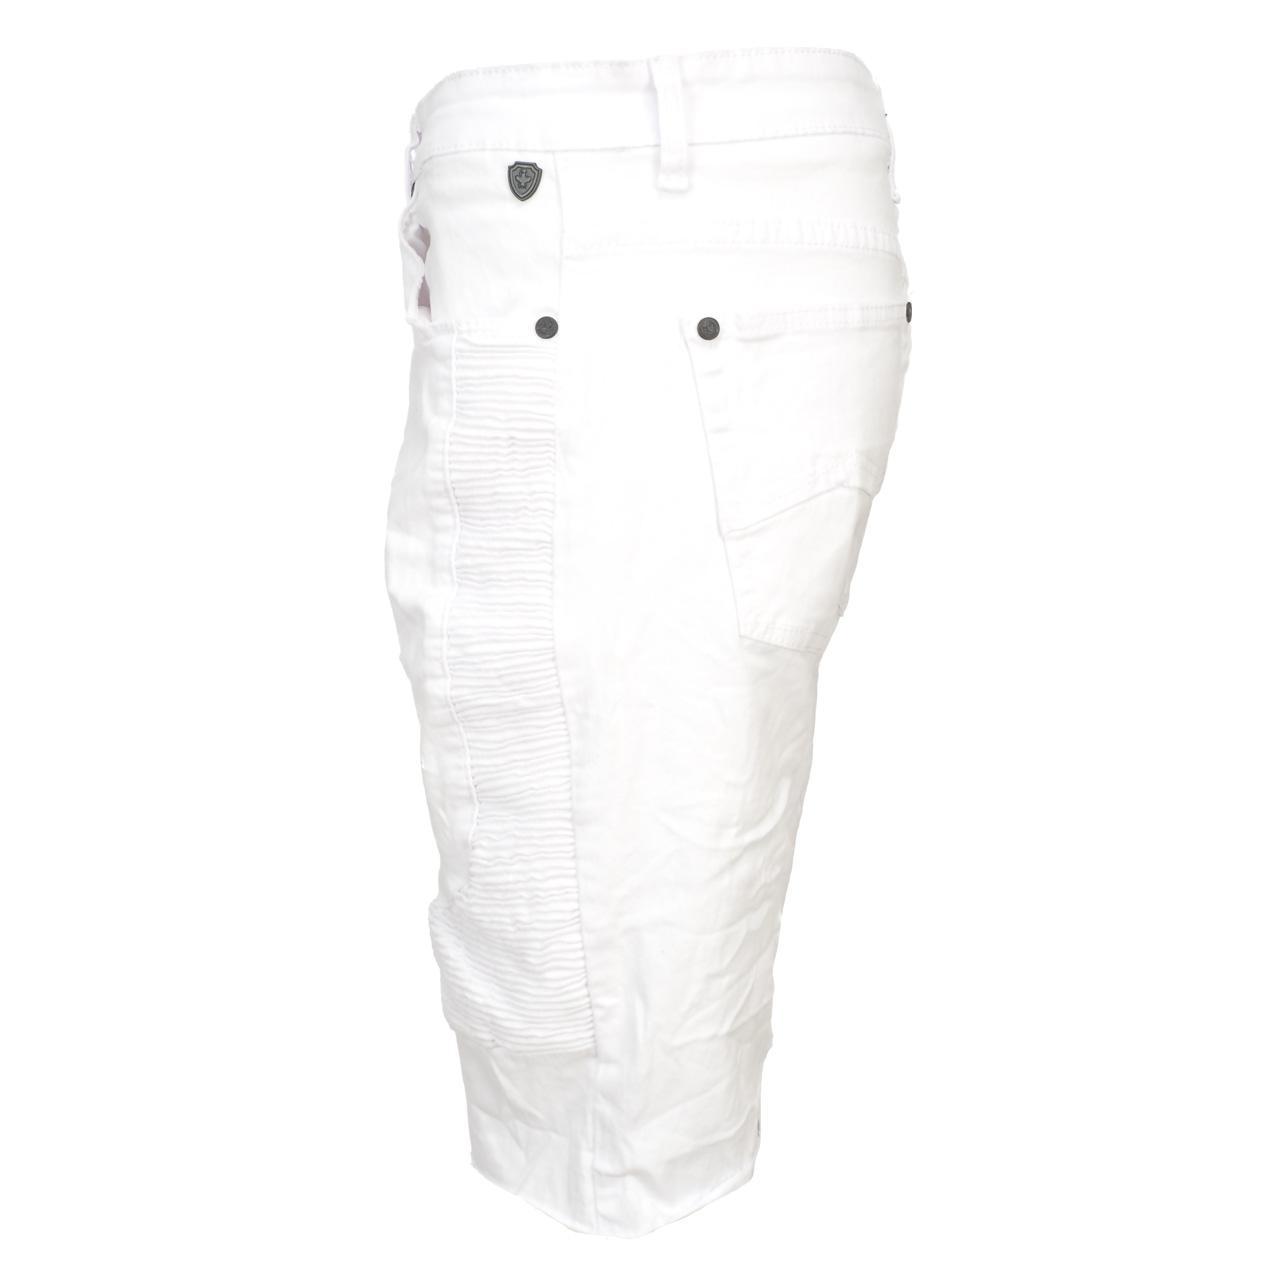 Bermuda-Shorts-Hite-Couture-Vibrate-White-Bermuda-White-11650-New thumbnail 2